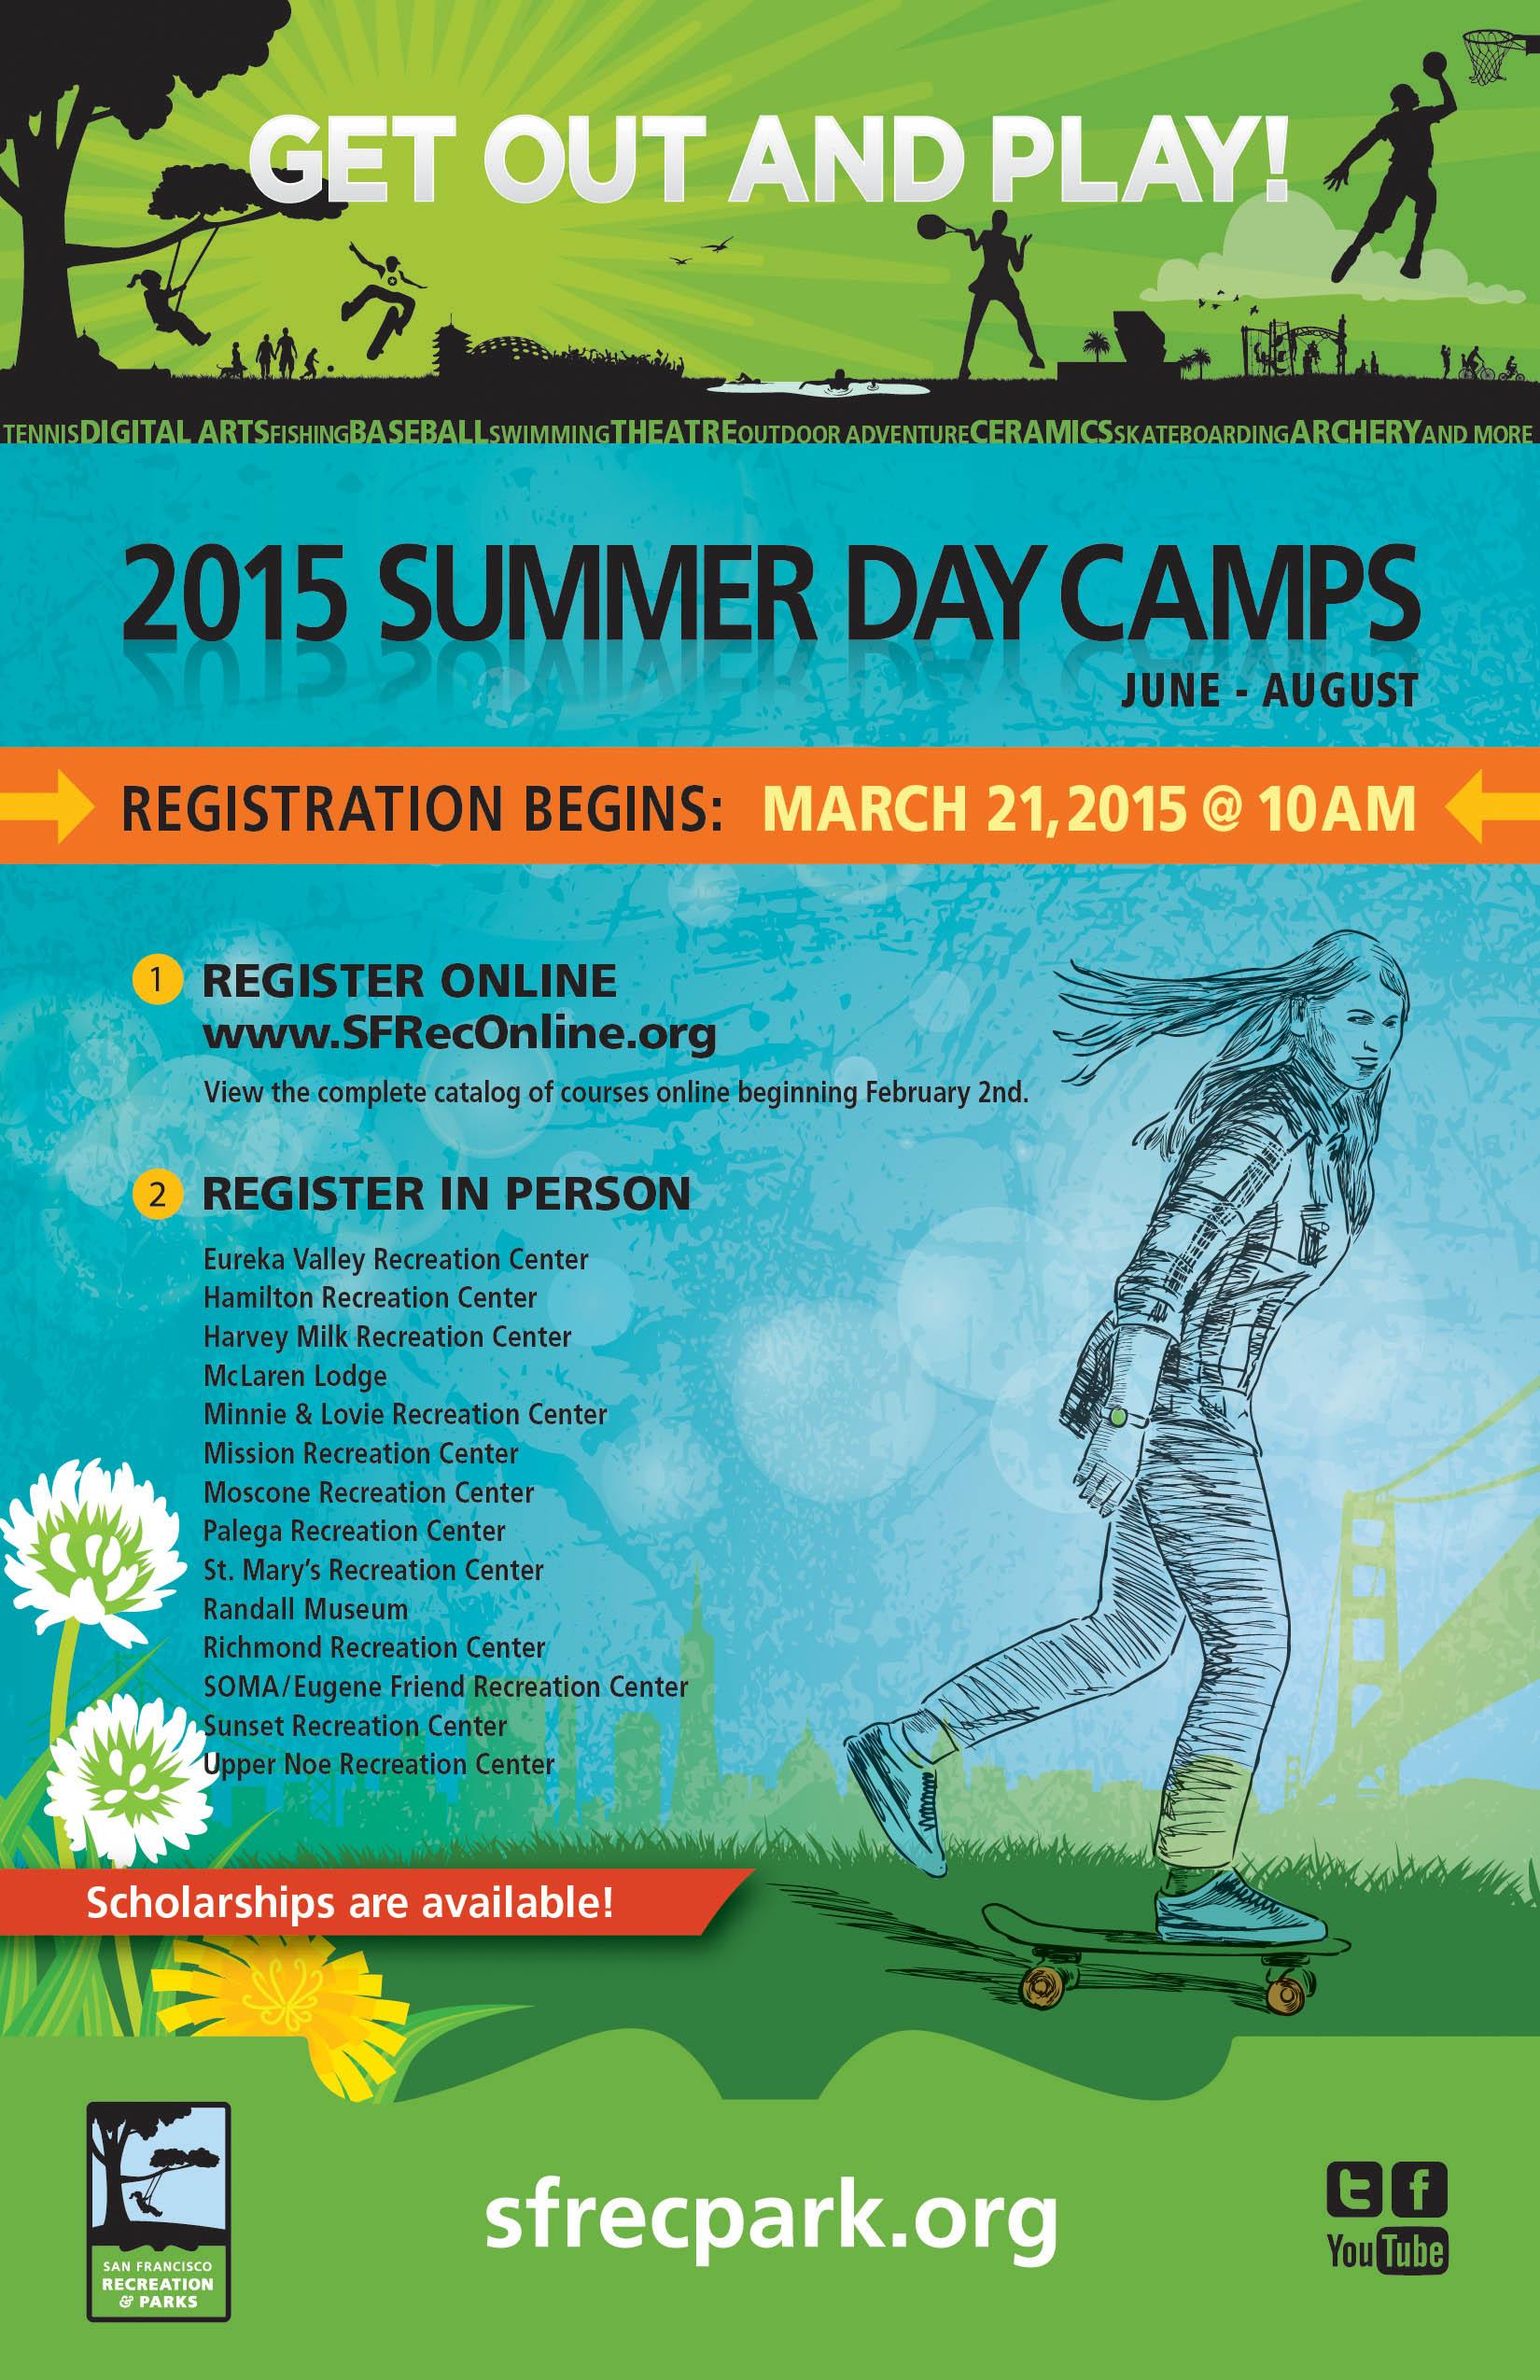 2015-SUMMER_DAY CAMP_POSTER_11x17_2015_v2-01.jpg